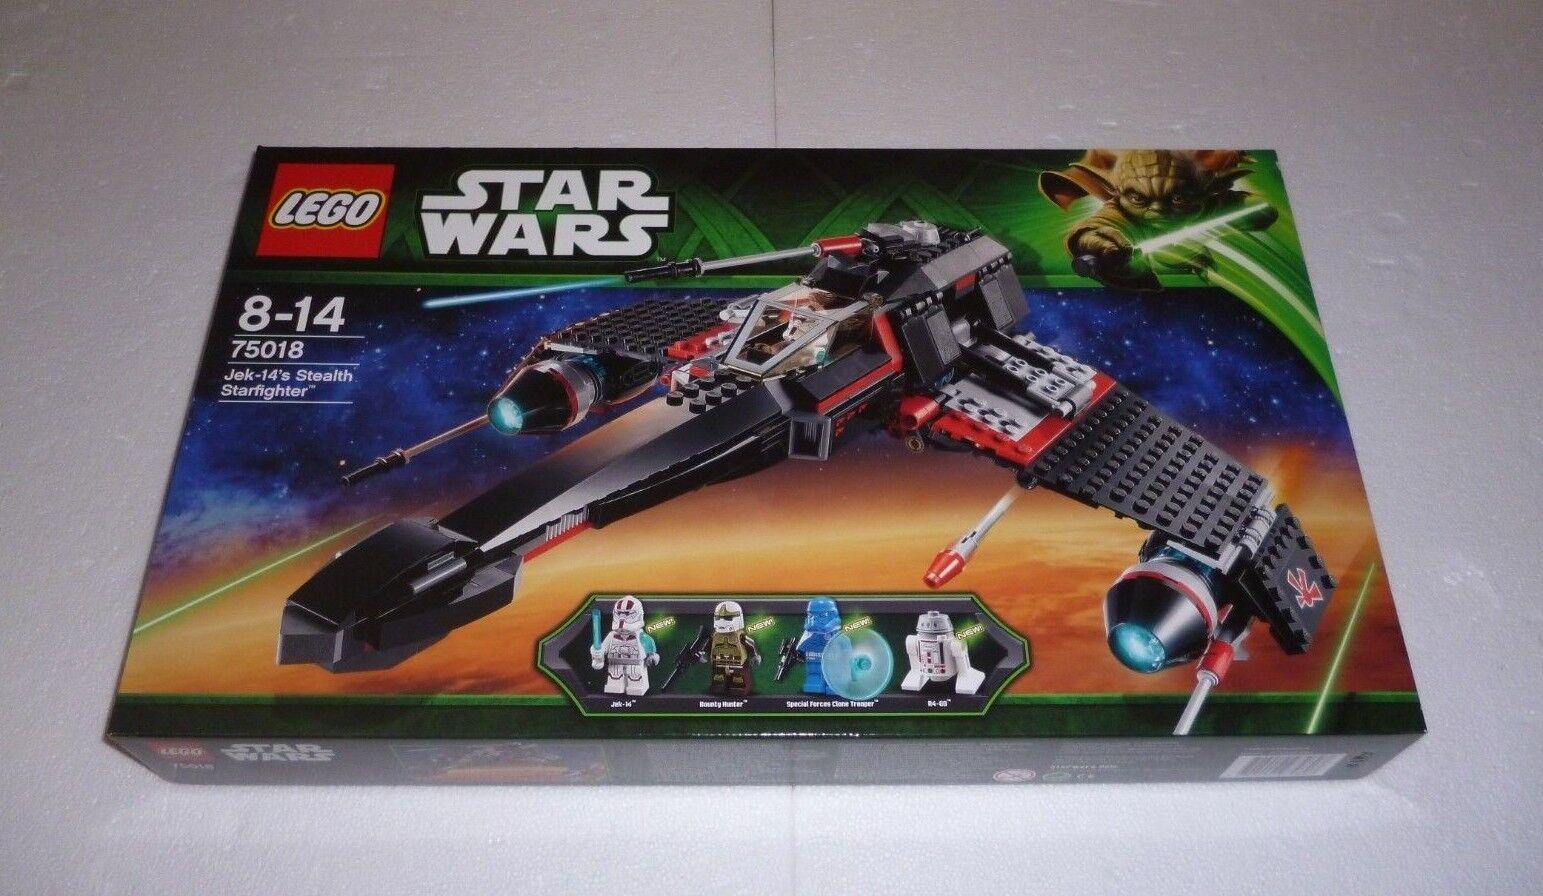 Lego star wars jek-14's stealth starfighter starfighter starfighter (75018) NEUF/NEW, NEUF dans sa boîte | à Gagnez Un Haut Admiration  b5211b